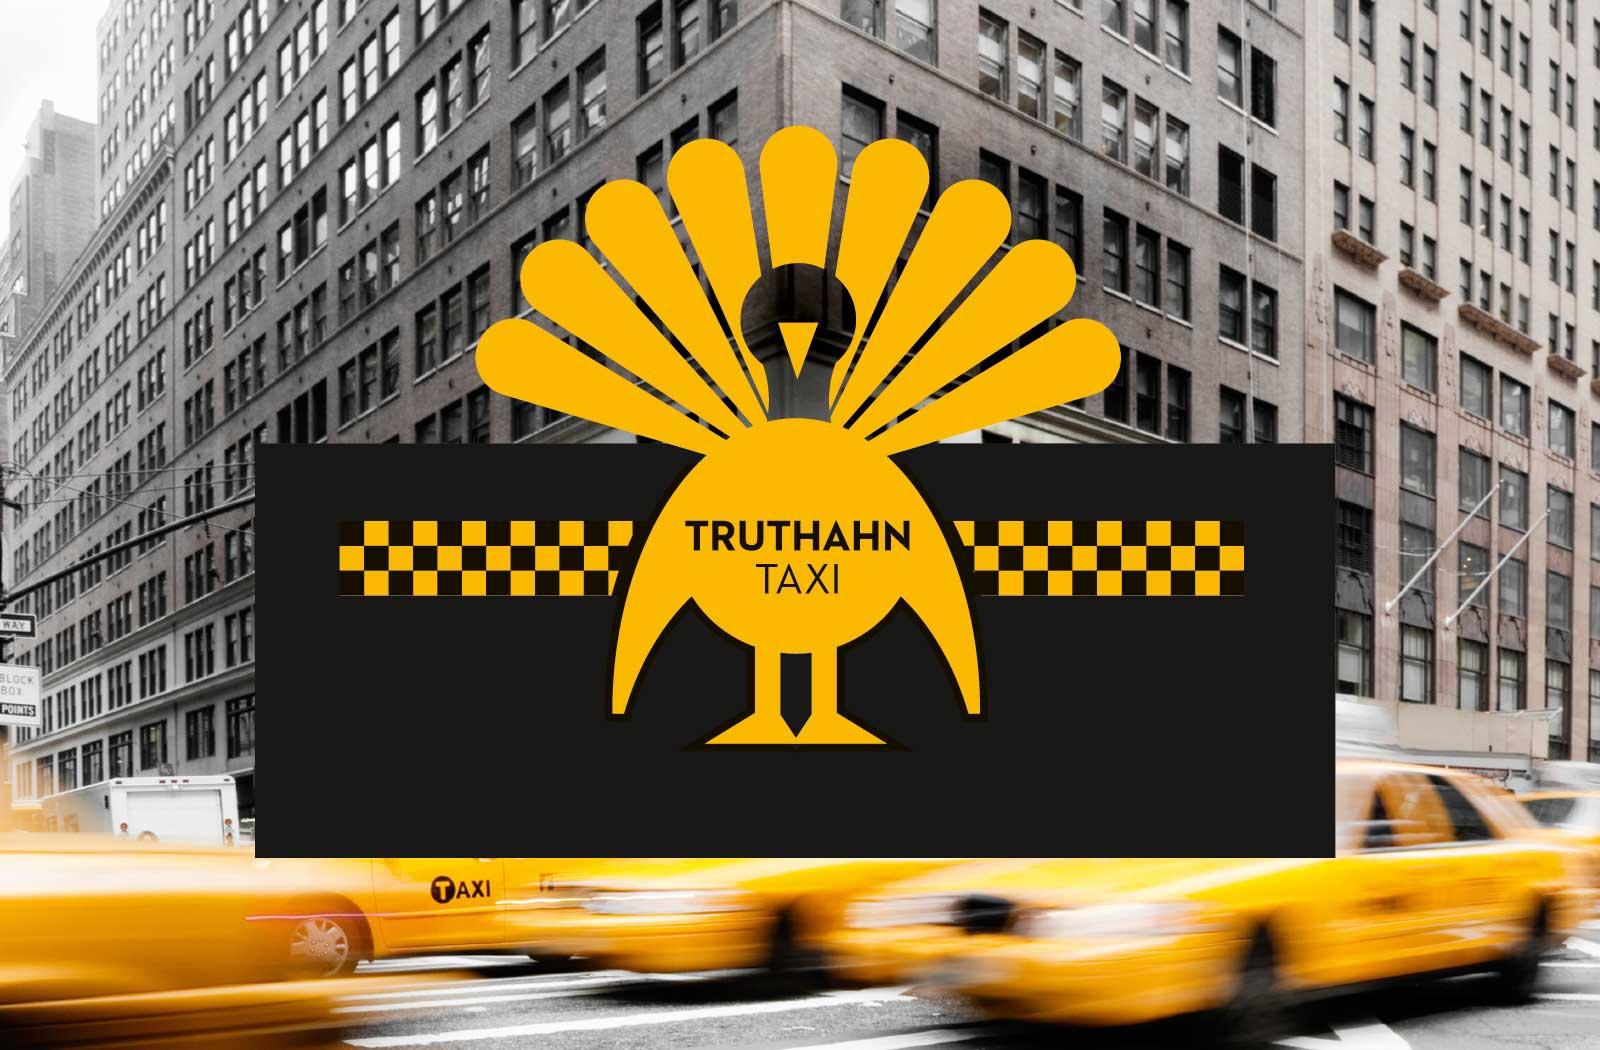 Truthahn Taxi - der etwas andere Caterer